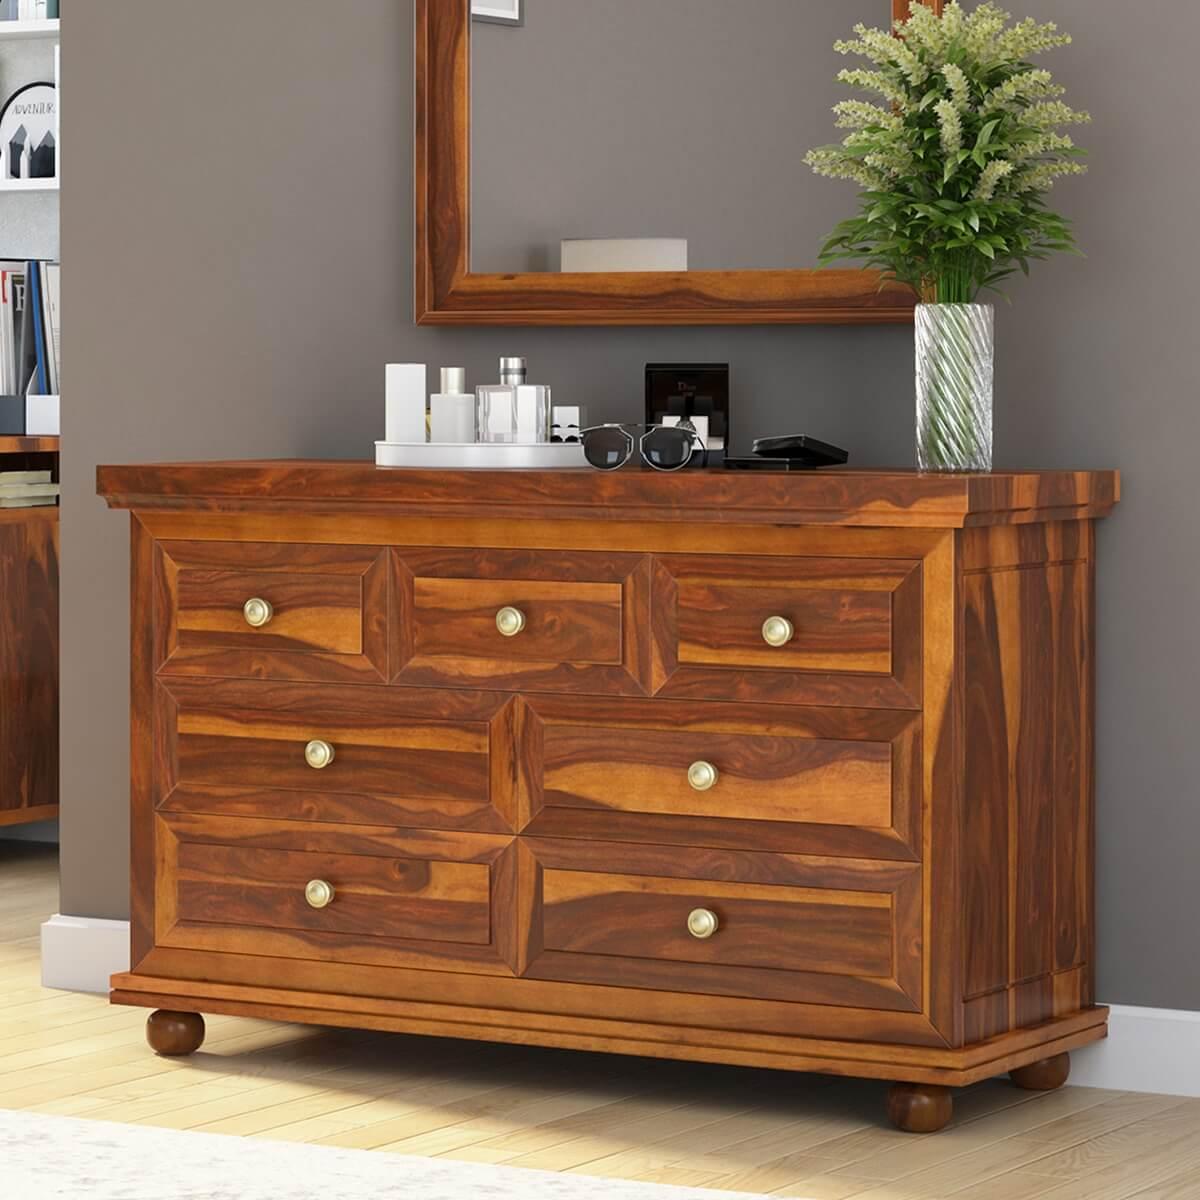 Pecos Solid Wood 7 Drawer Bedroom Dresser Chest